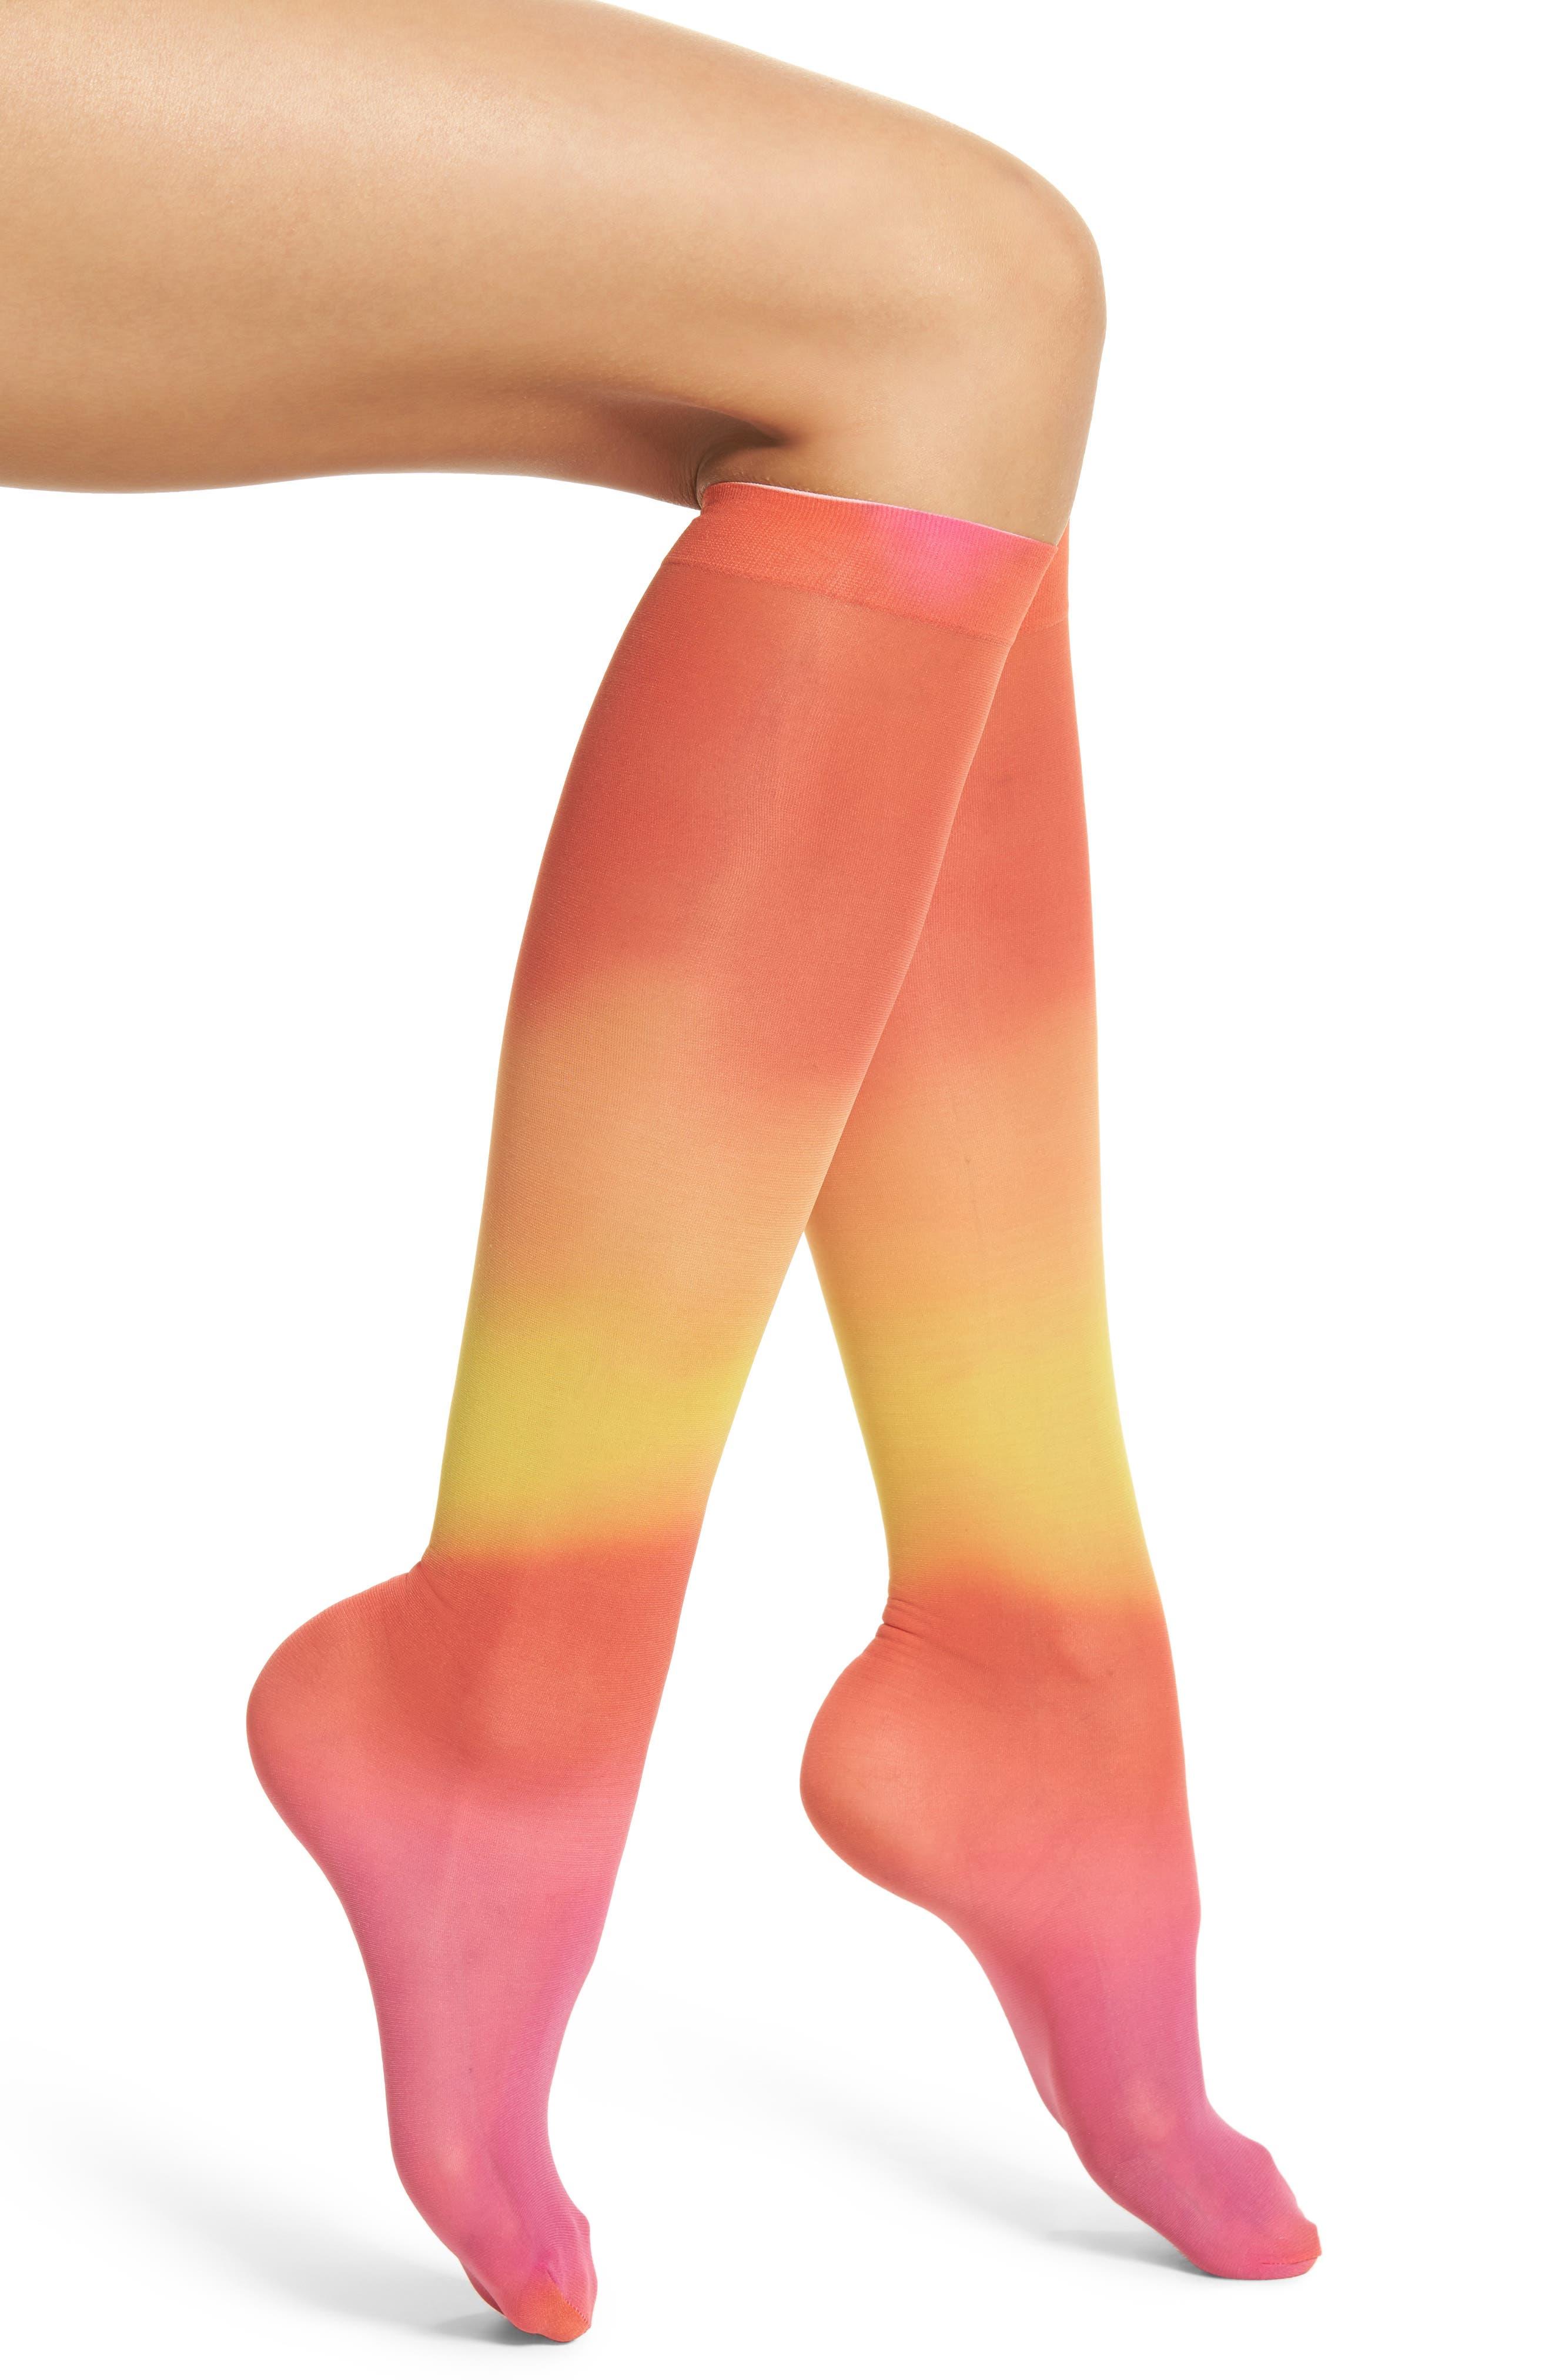 Mia Print Knee High Socks,                             Main thumbnail 1, color,                             700